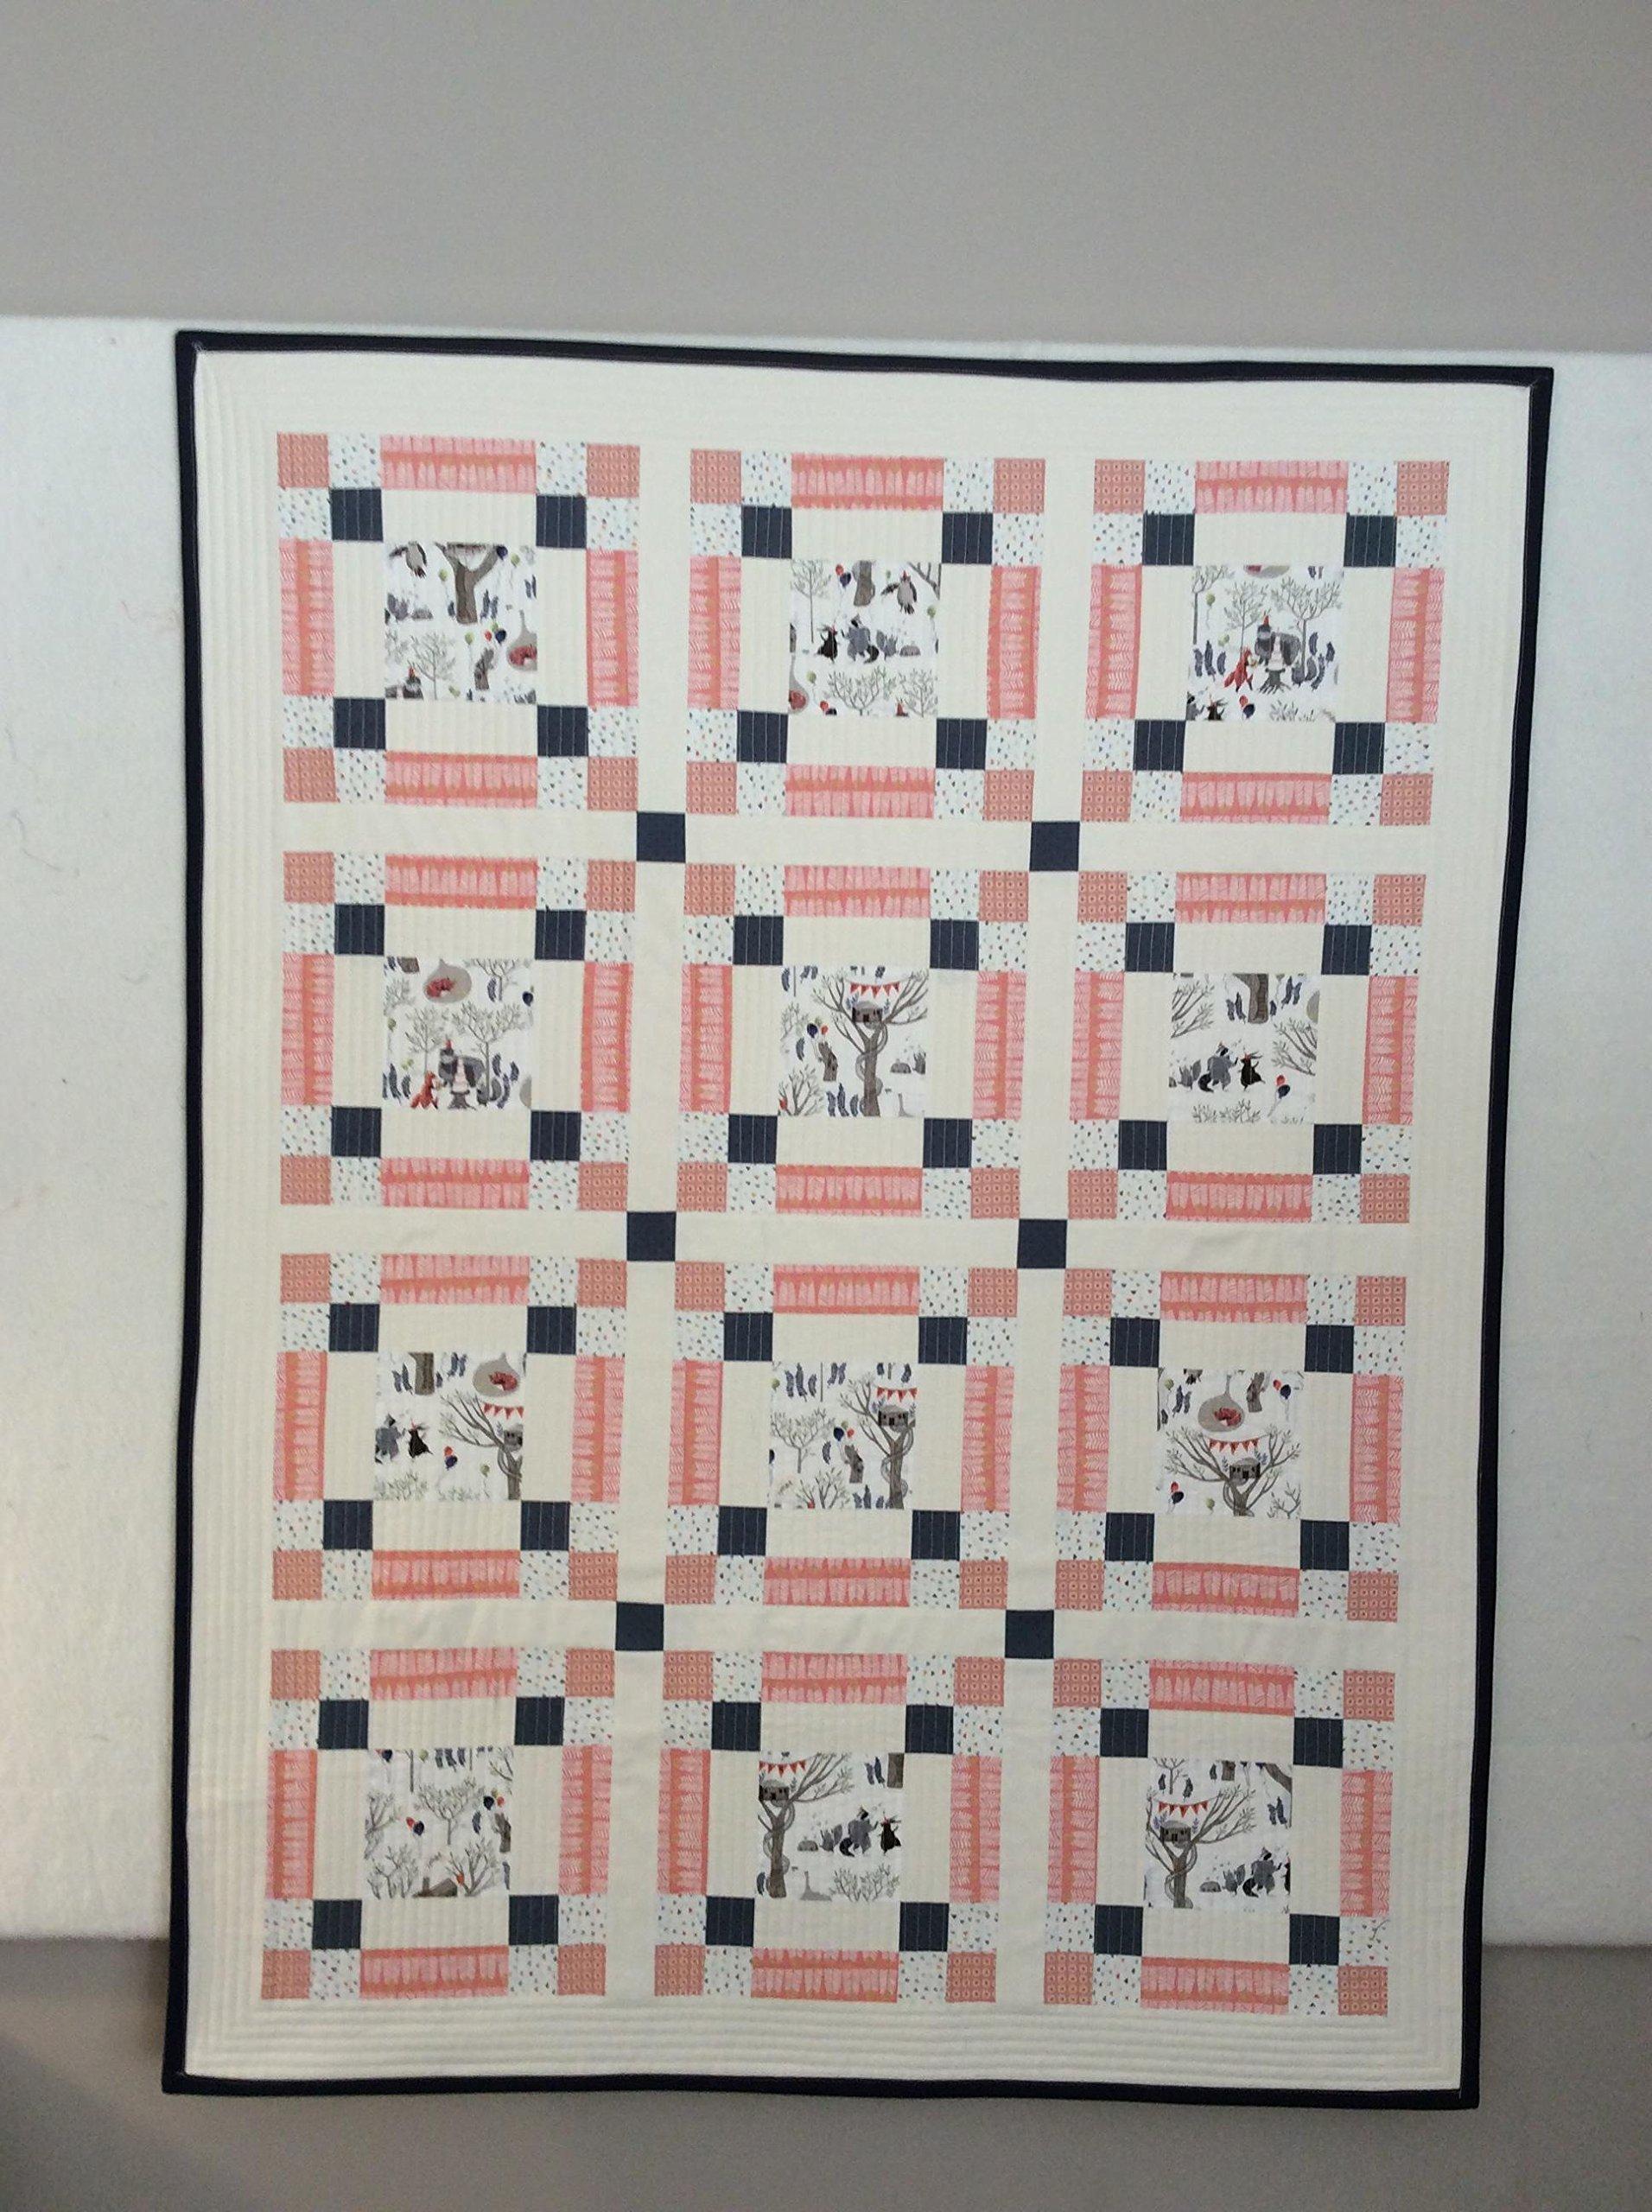 Baby Quilt - Modern Baby Quilt - Modern Toddler Quilt - Crib Quilt - Woodland Quilt - Handmade Baby Quilt - Pink Quilt - Baby Girl Quilt